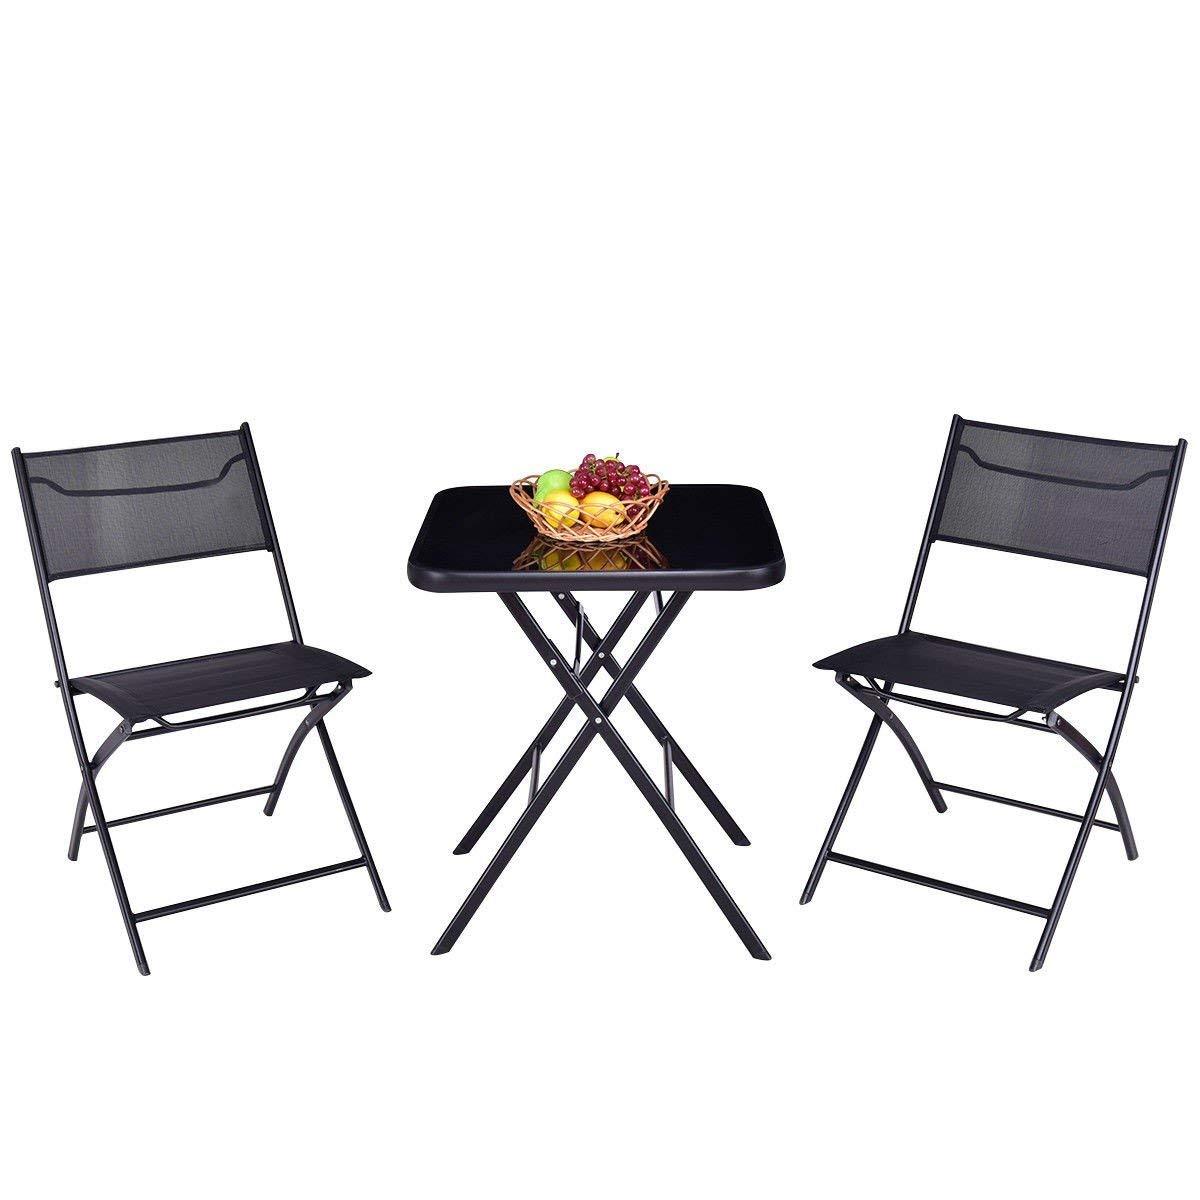 e346e3fd27af Cheap Round Folding Table Costco, find Round Folding Table Costco ...